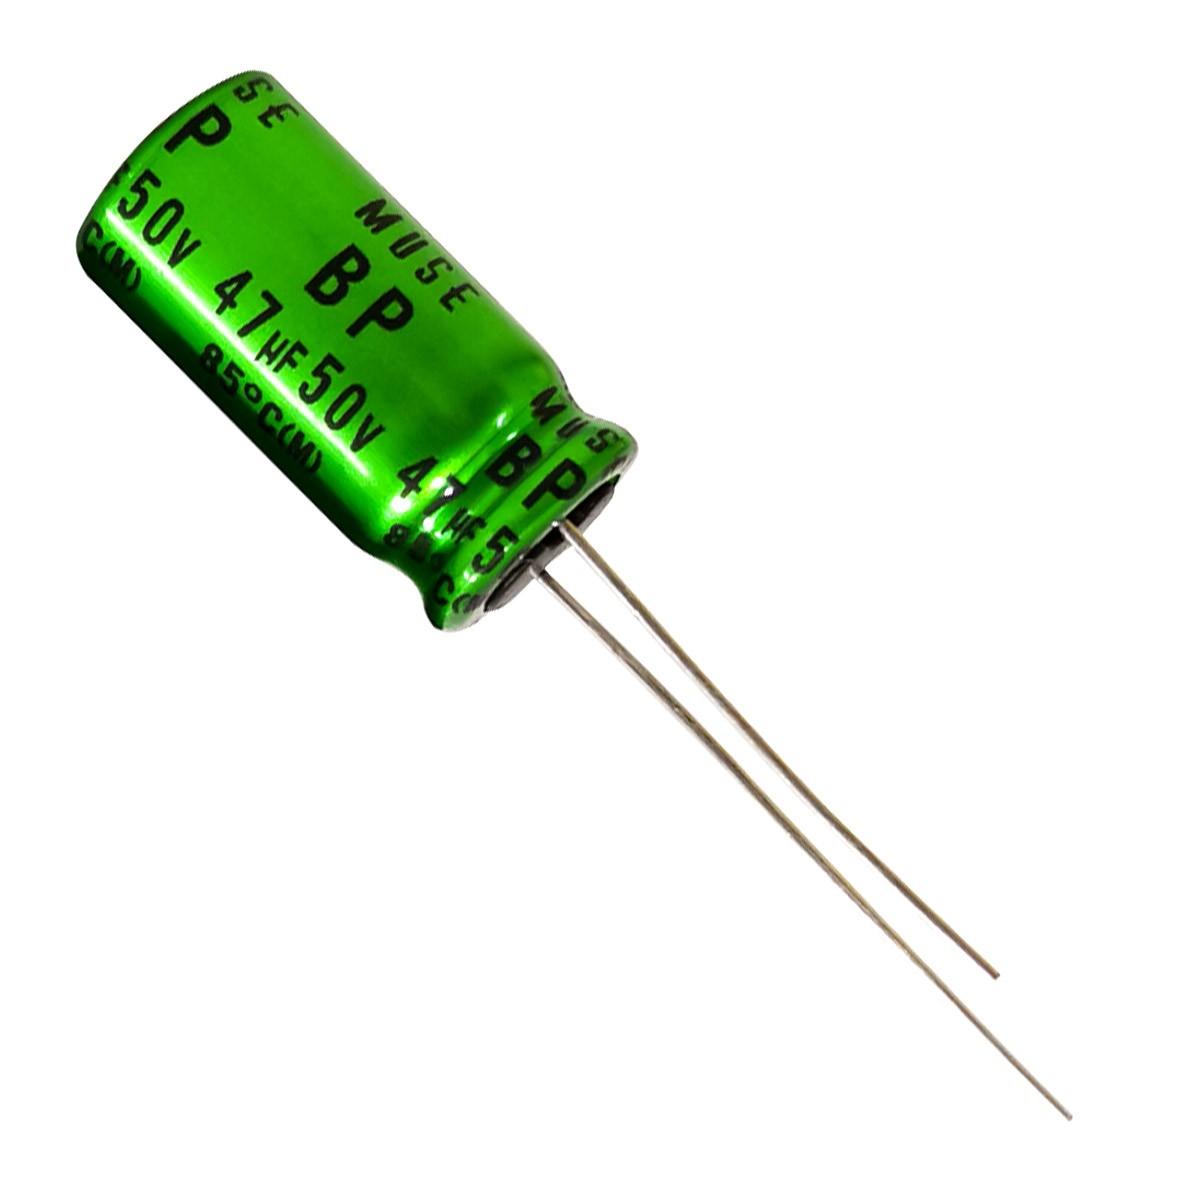 NICHICON ES MUSE Condensateur Audio Audiophile 35V 100µF